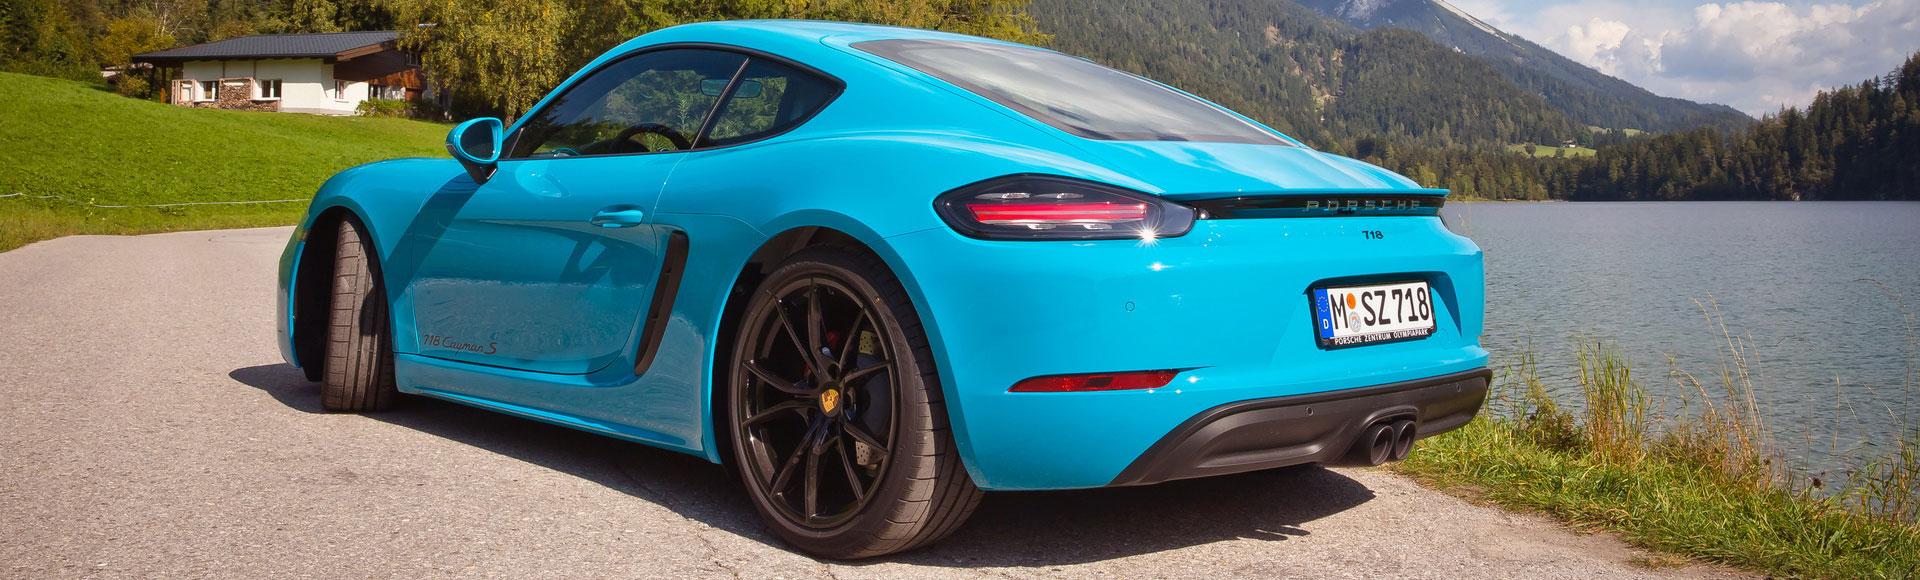 Porsche 718 Cayman 2016 039 Sommer